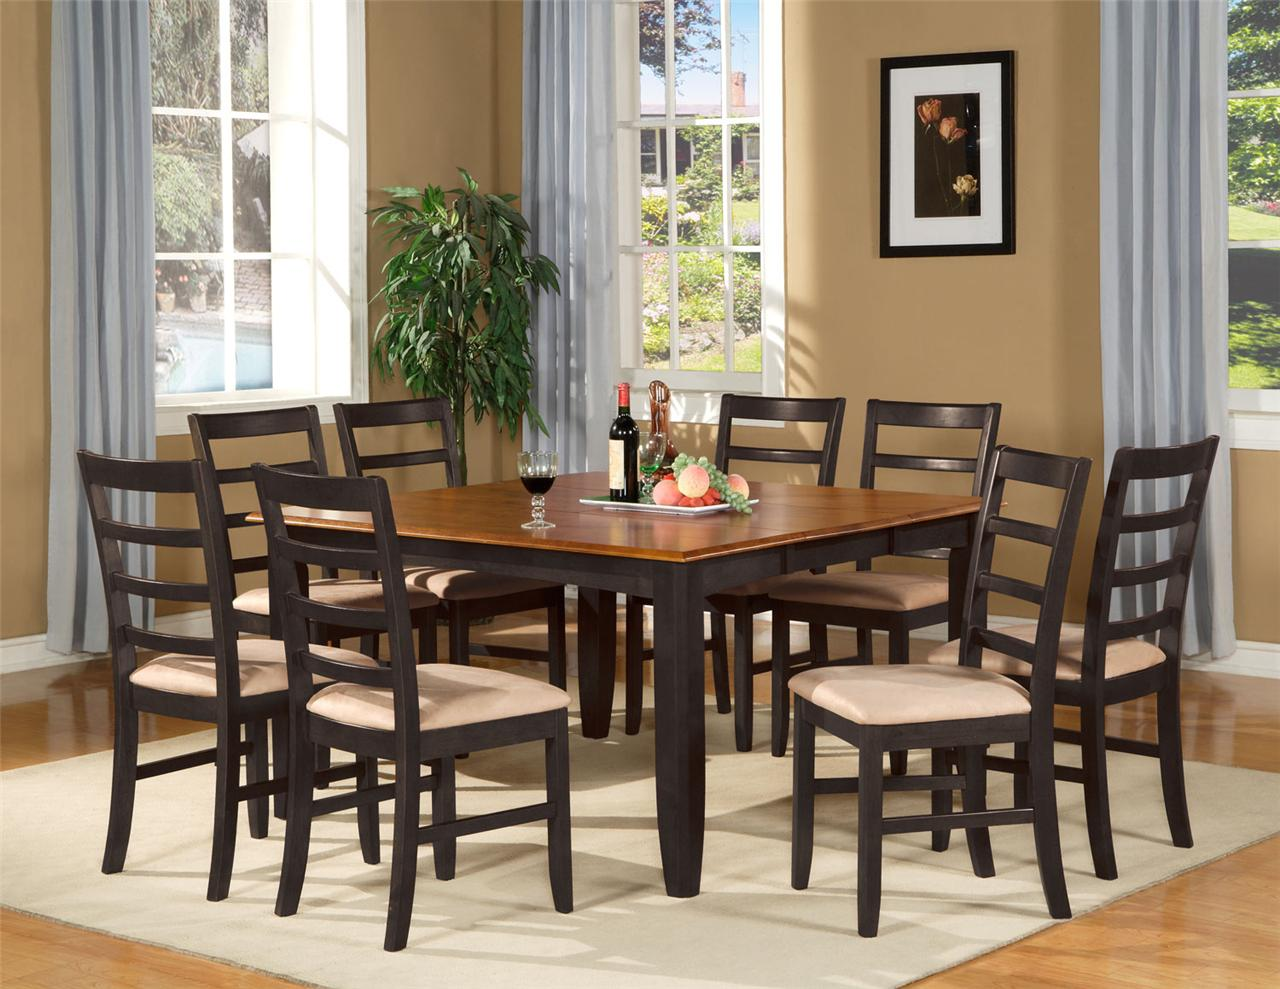 Square kitchen table sets photo - 2